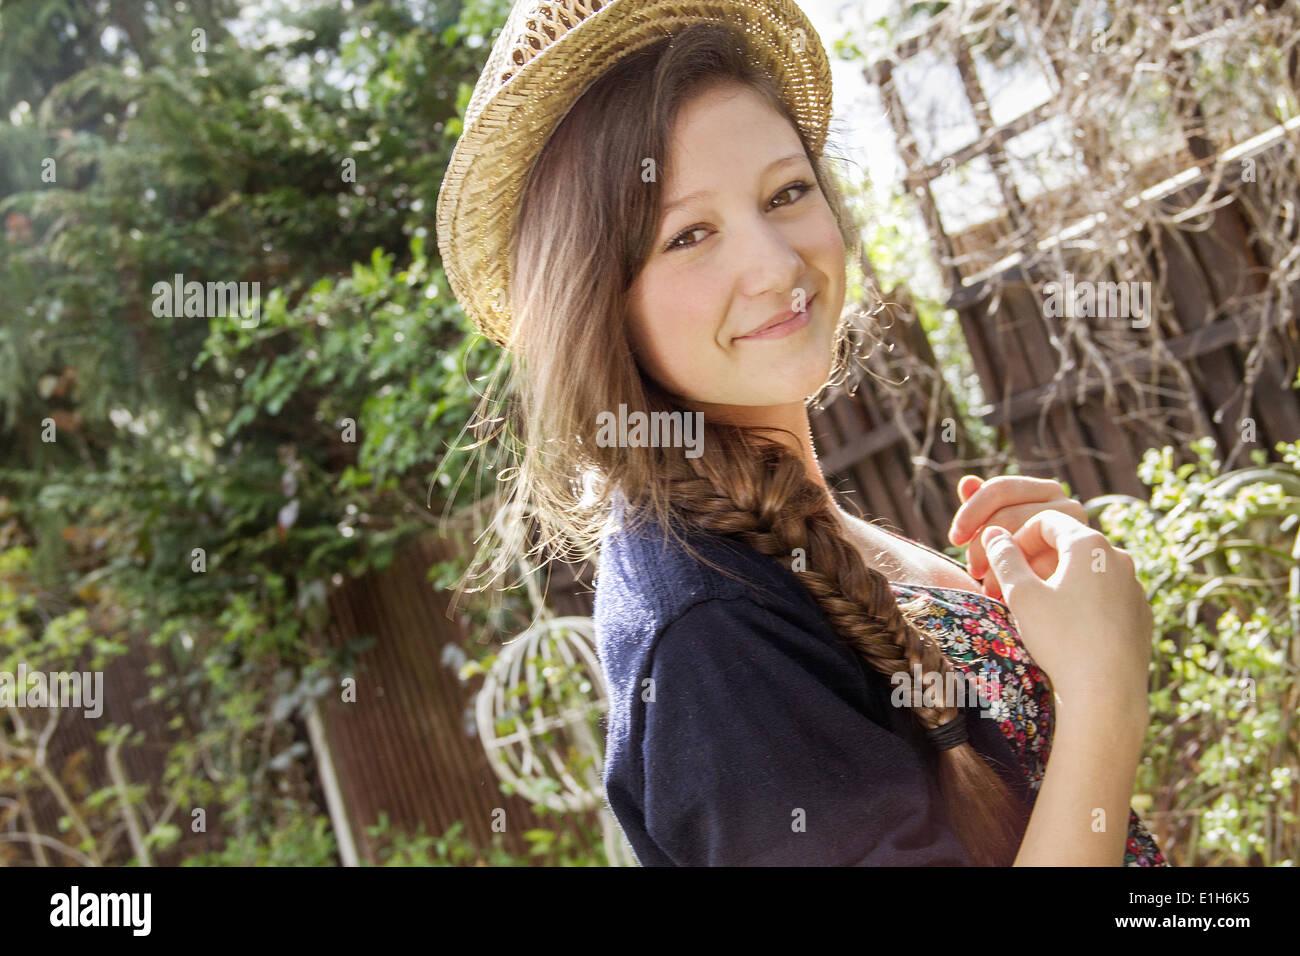 Portrait of teenage girl in straw hat in garden - Stock Image